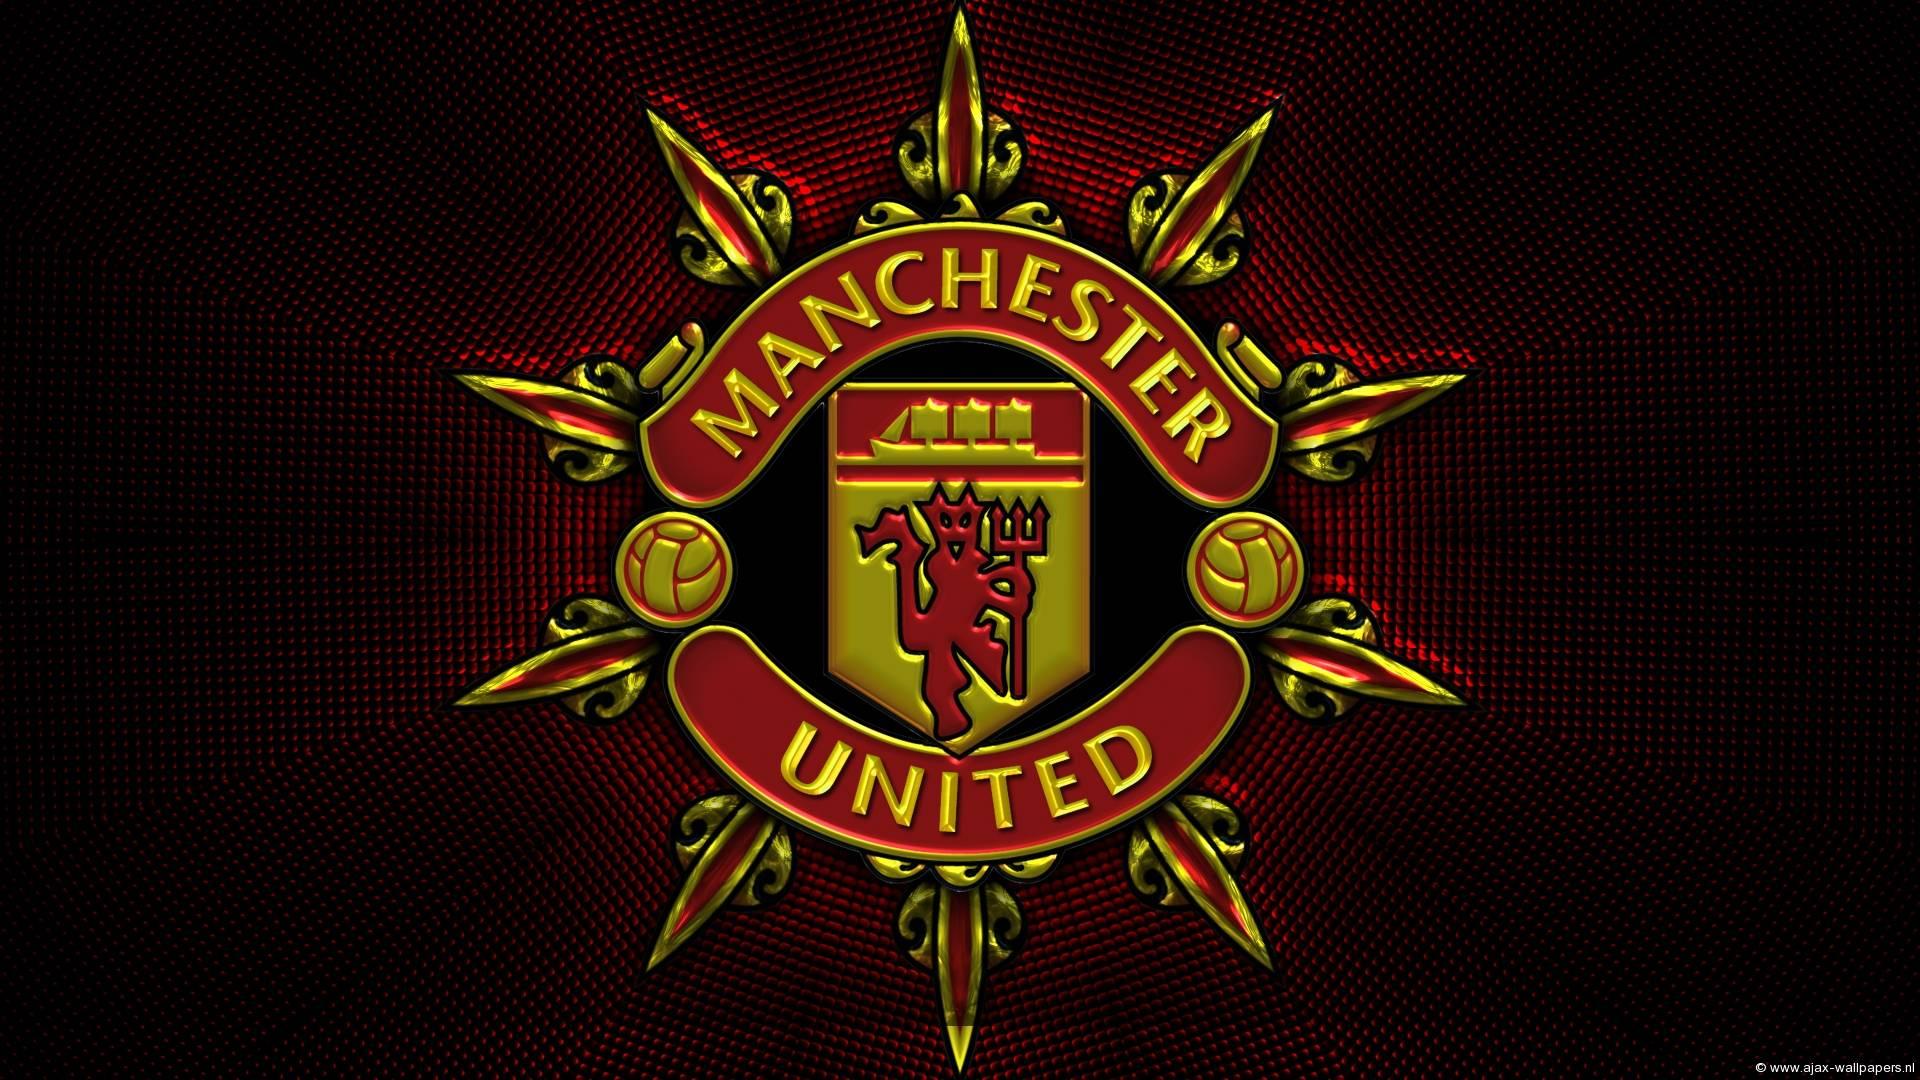 Manchester United Wallpaper Logos